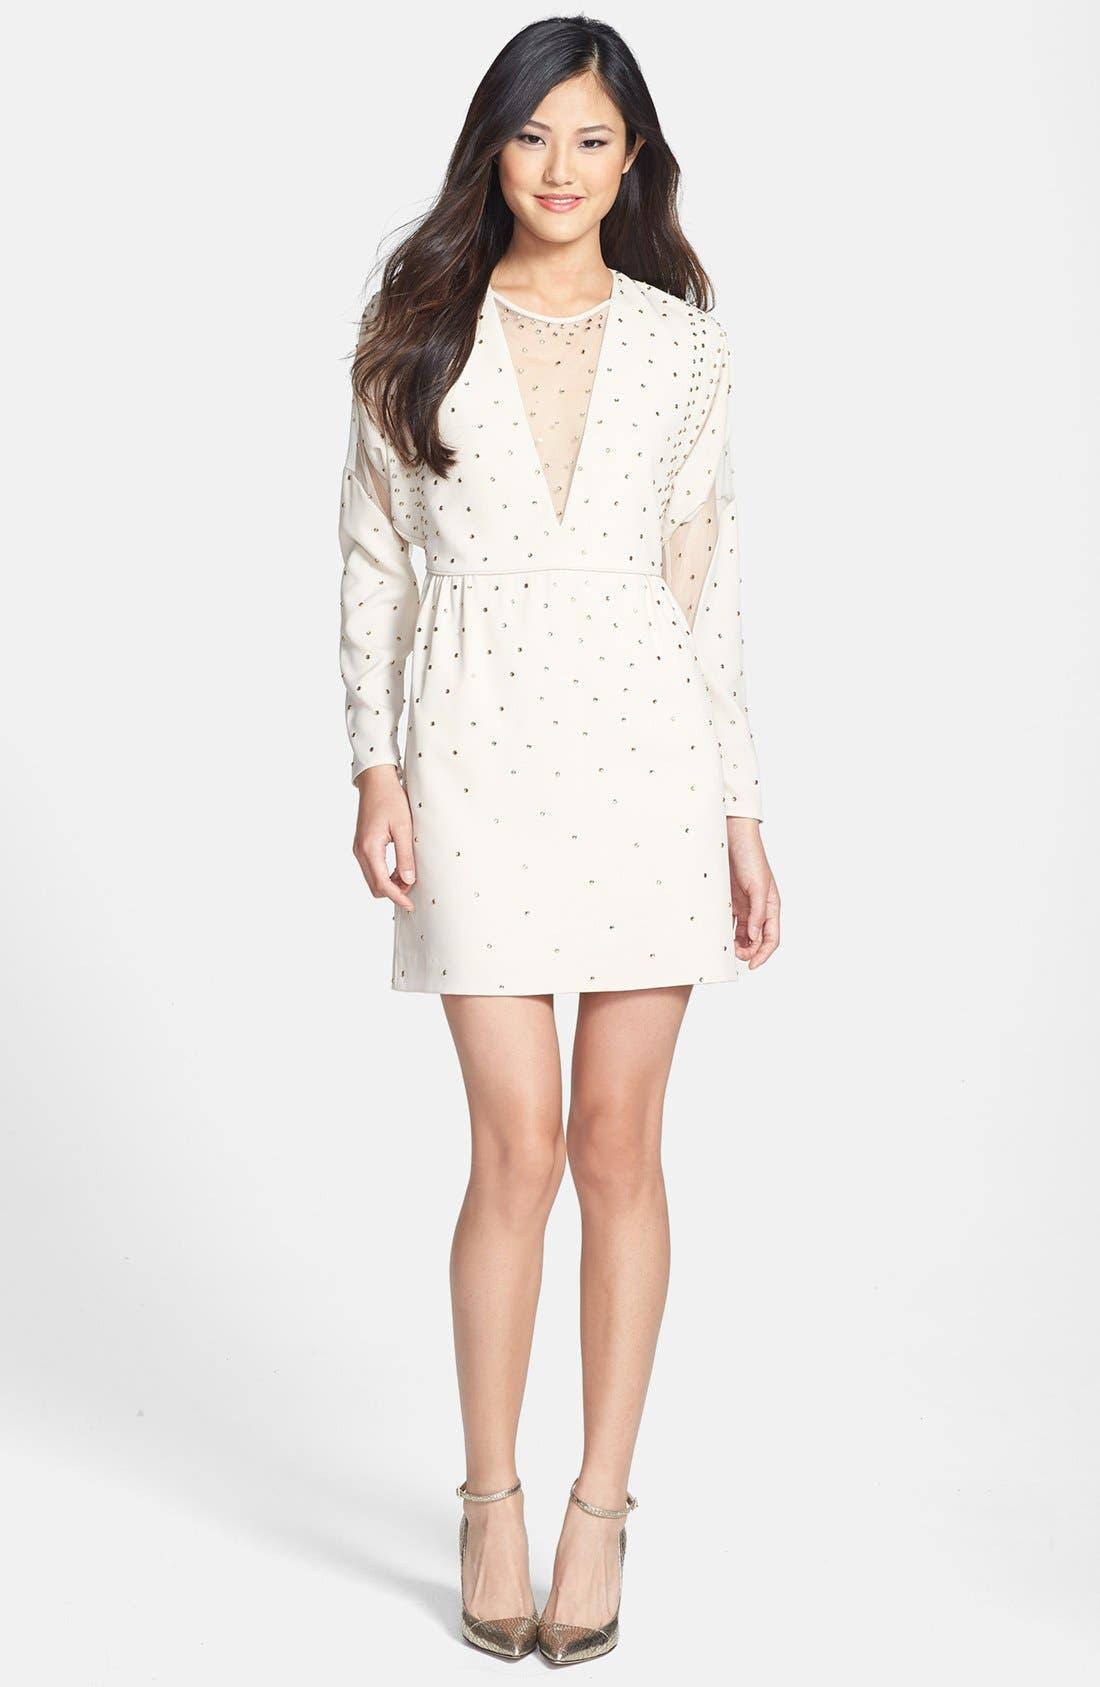 Main Image - BCBGMAXAZRIA Illusion Cutout Embellished Dress